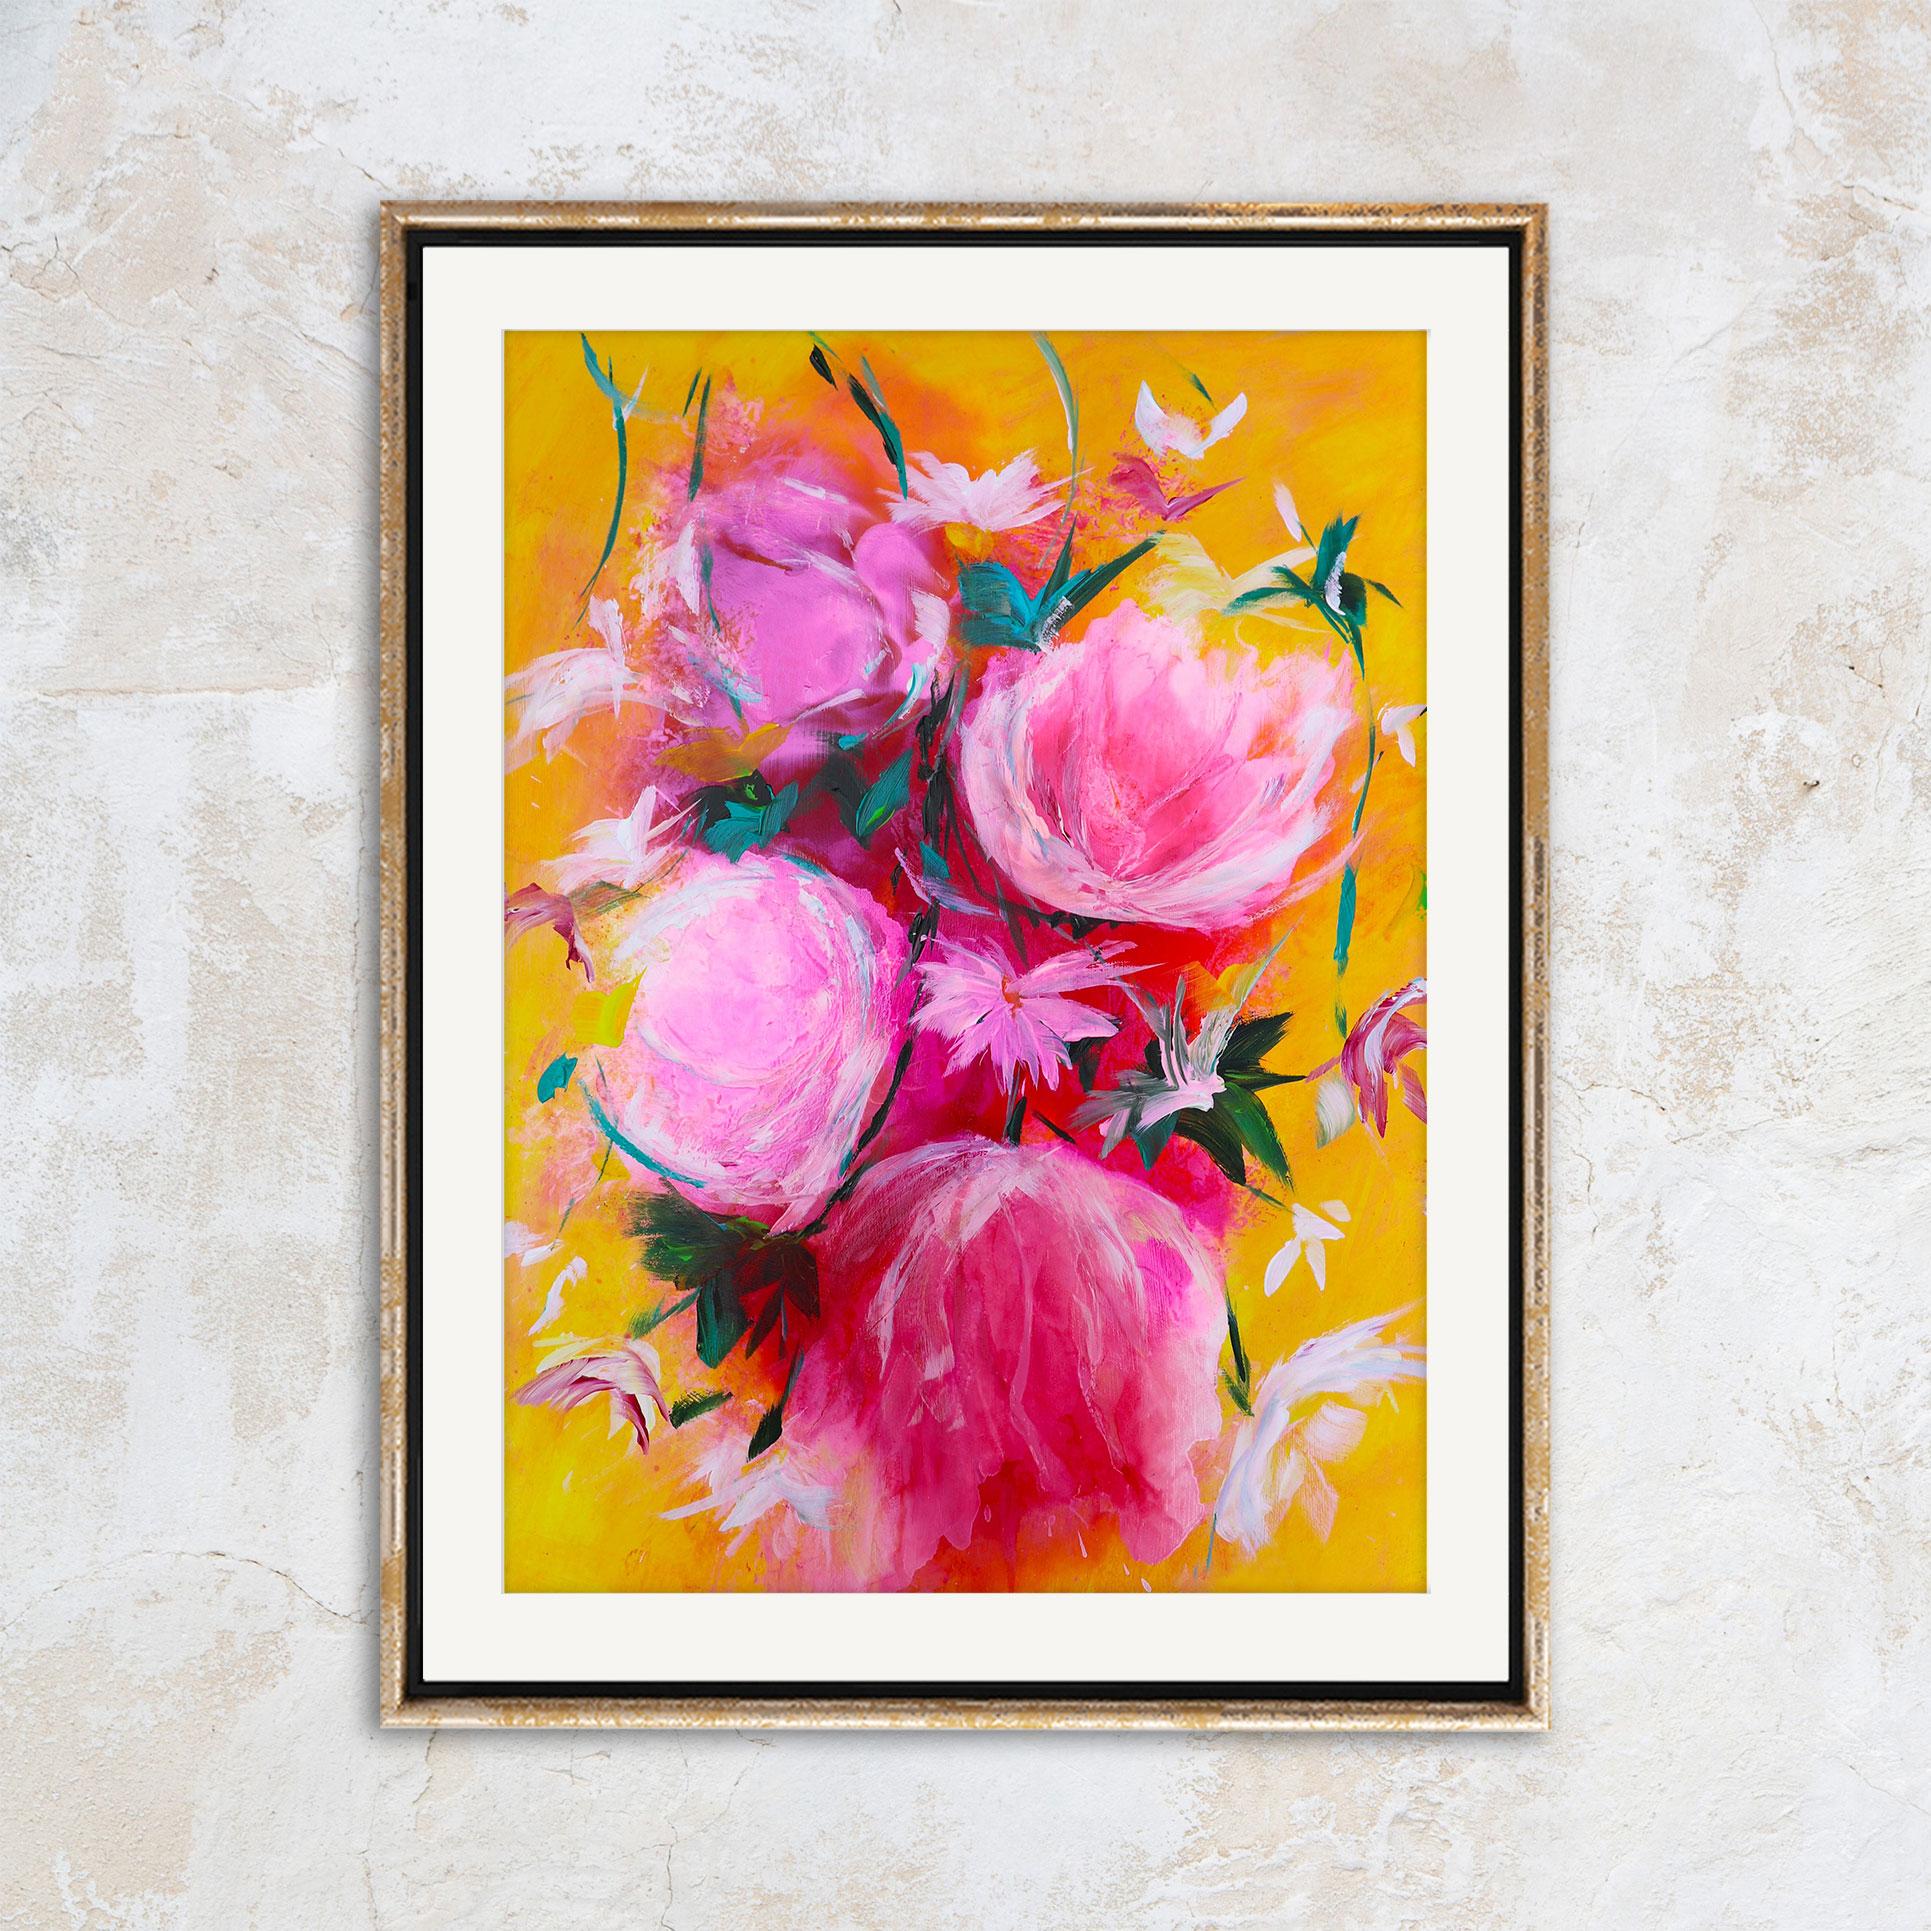 AB_FloralsInBloom_SquareArtwork_03sfw.jpg